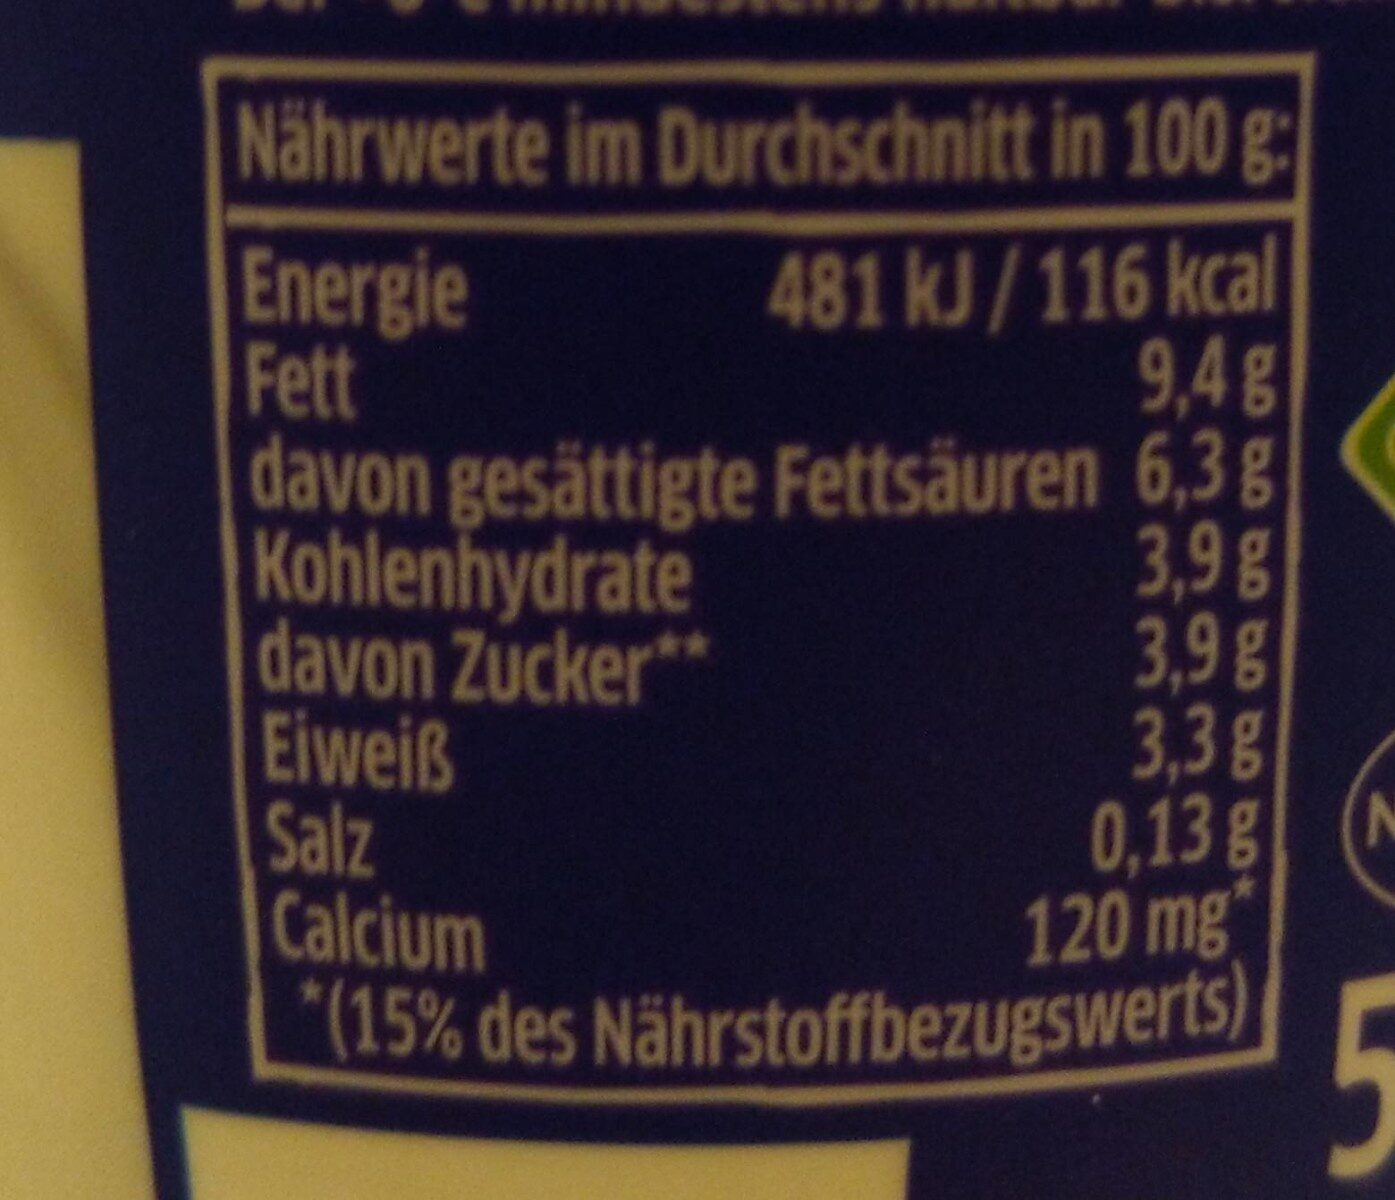 Elinas Griechischer Joghurt Natur, 500 g - Nährwertangaben - de